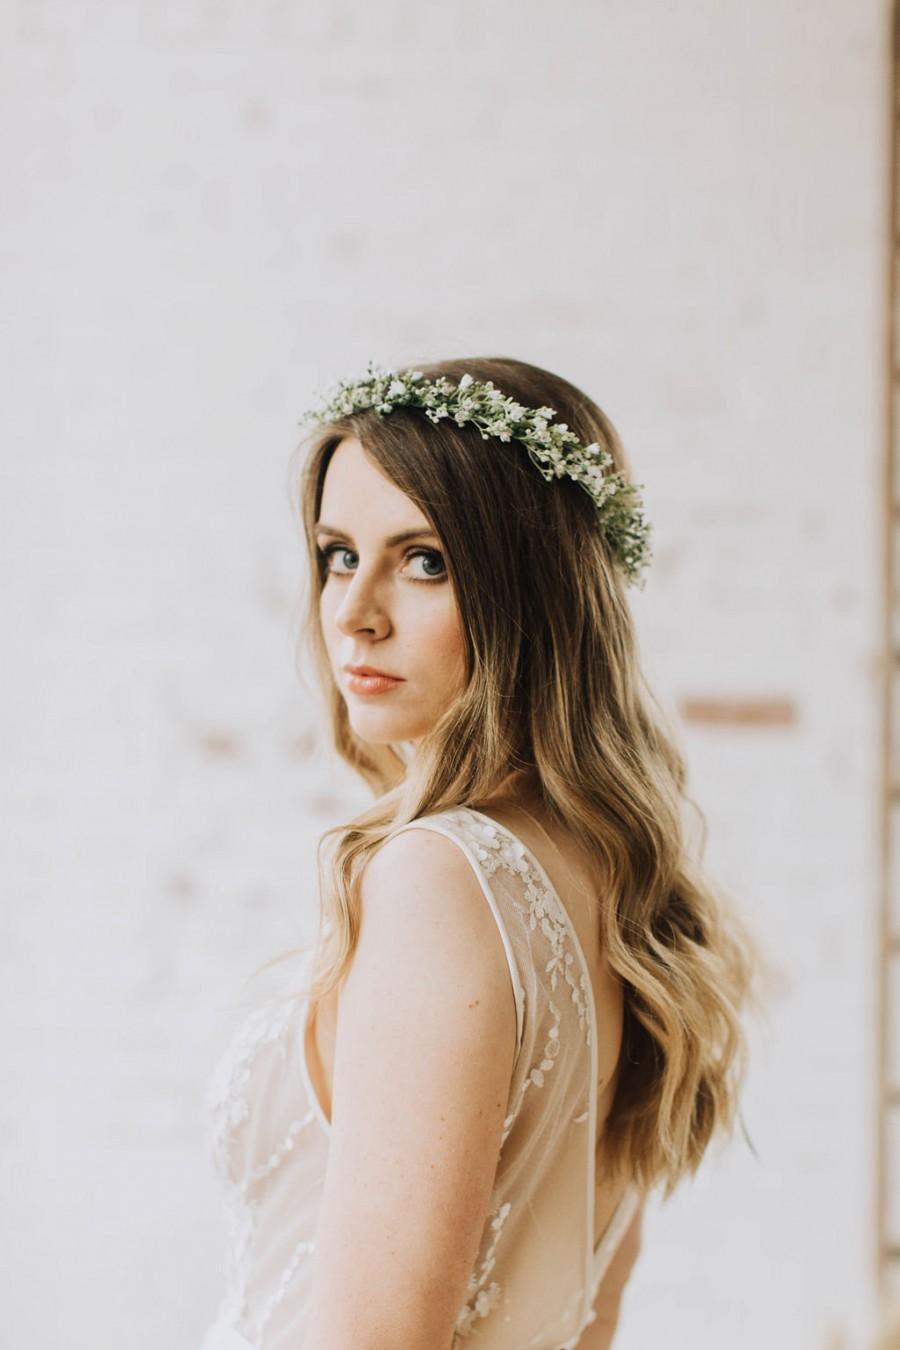 Mariage - Gyp crown, snow crown, babies breath crown, Woodland crown, ivory halo, Faerie crown, woodland hairpiece, woodland wedding, statement crown